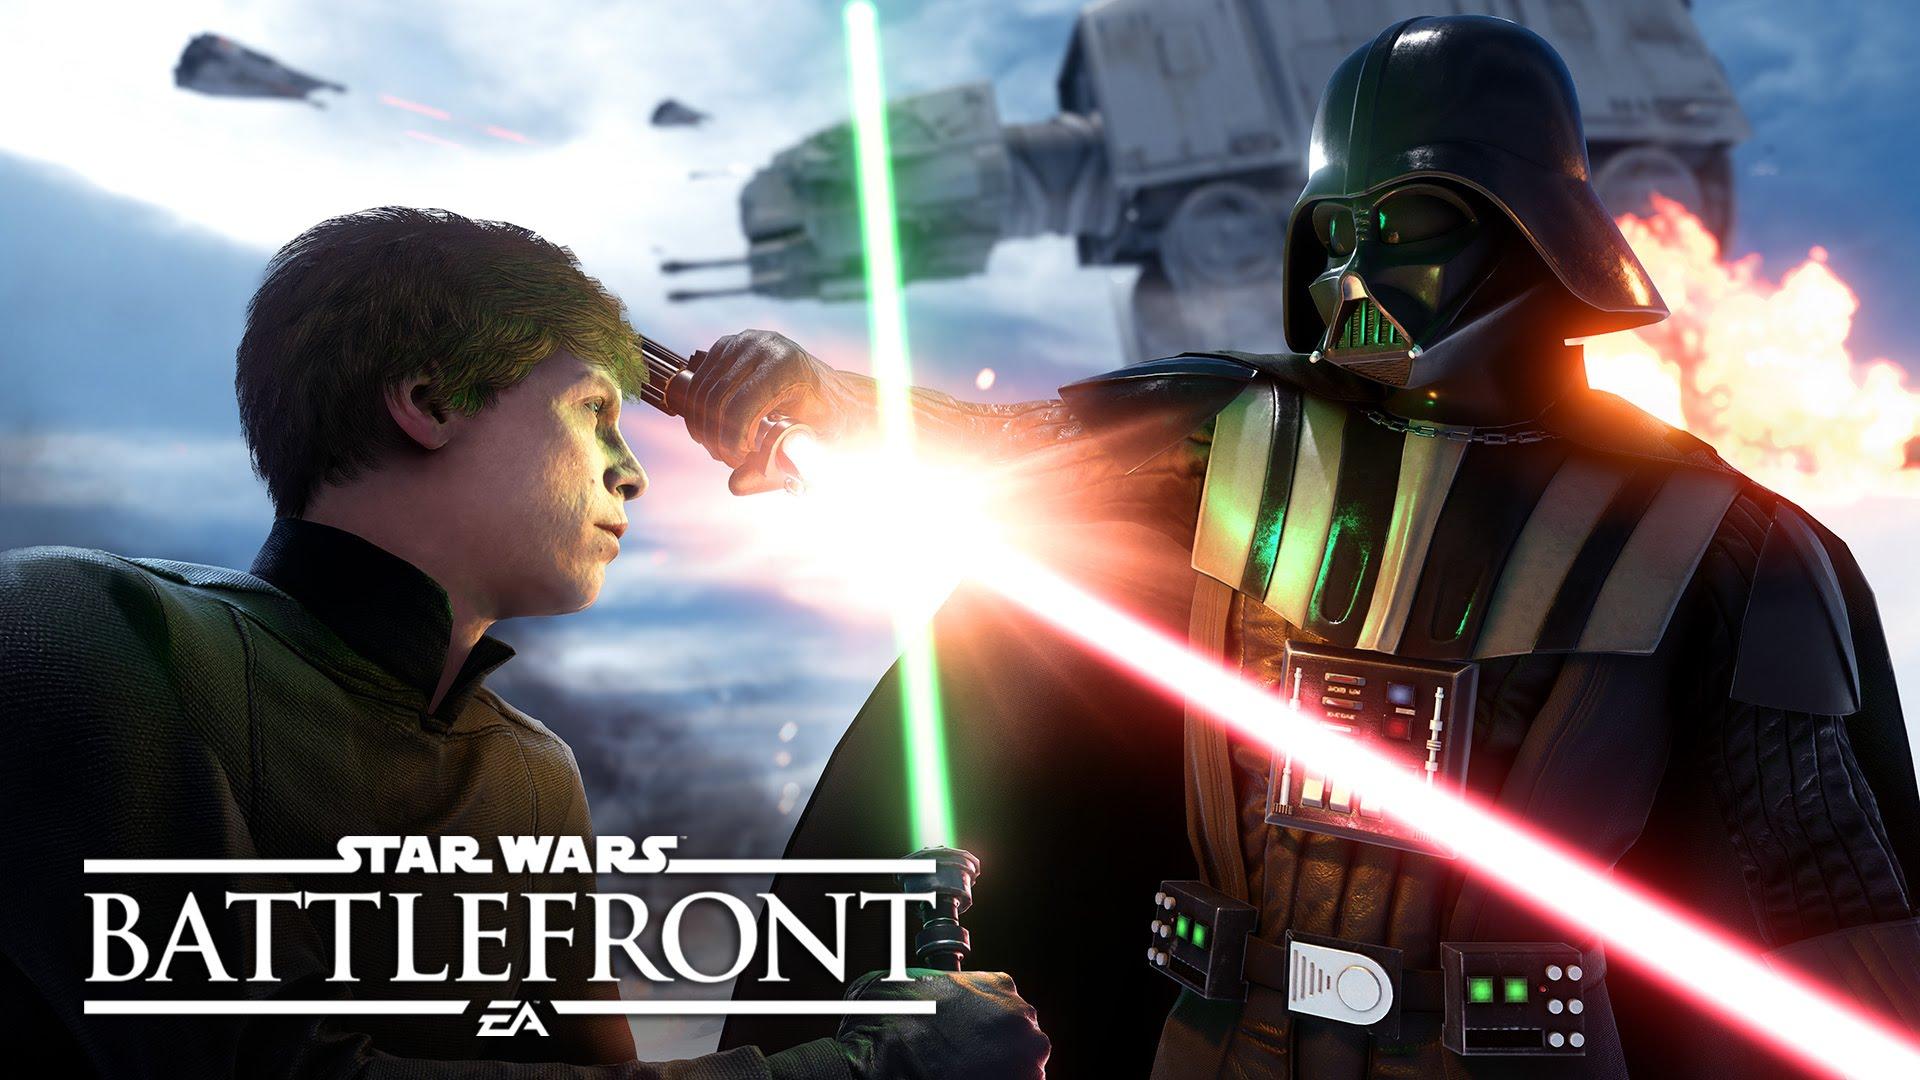 Star Wars Battlefront 3 Game Wallpaper Darth Image Dark Force Science Fiction Fan Group Mod Db